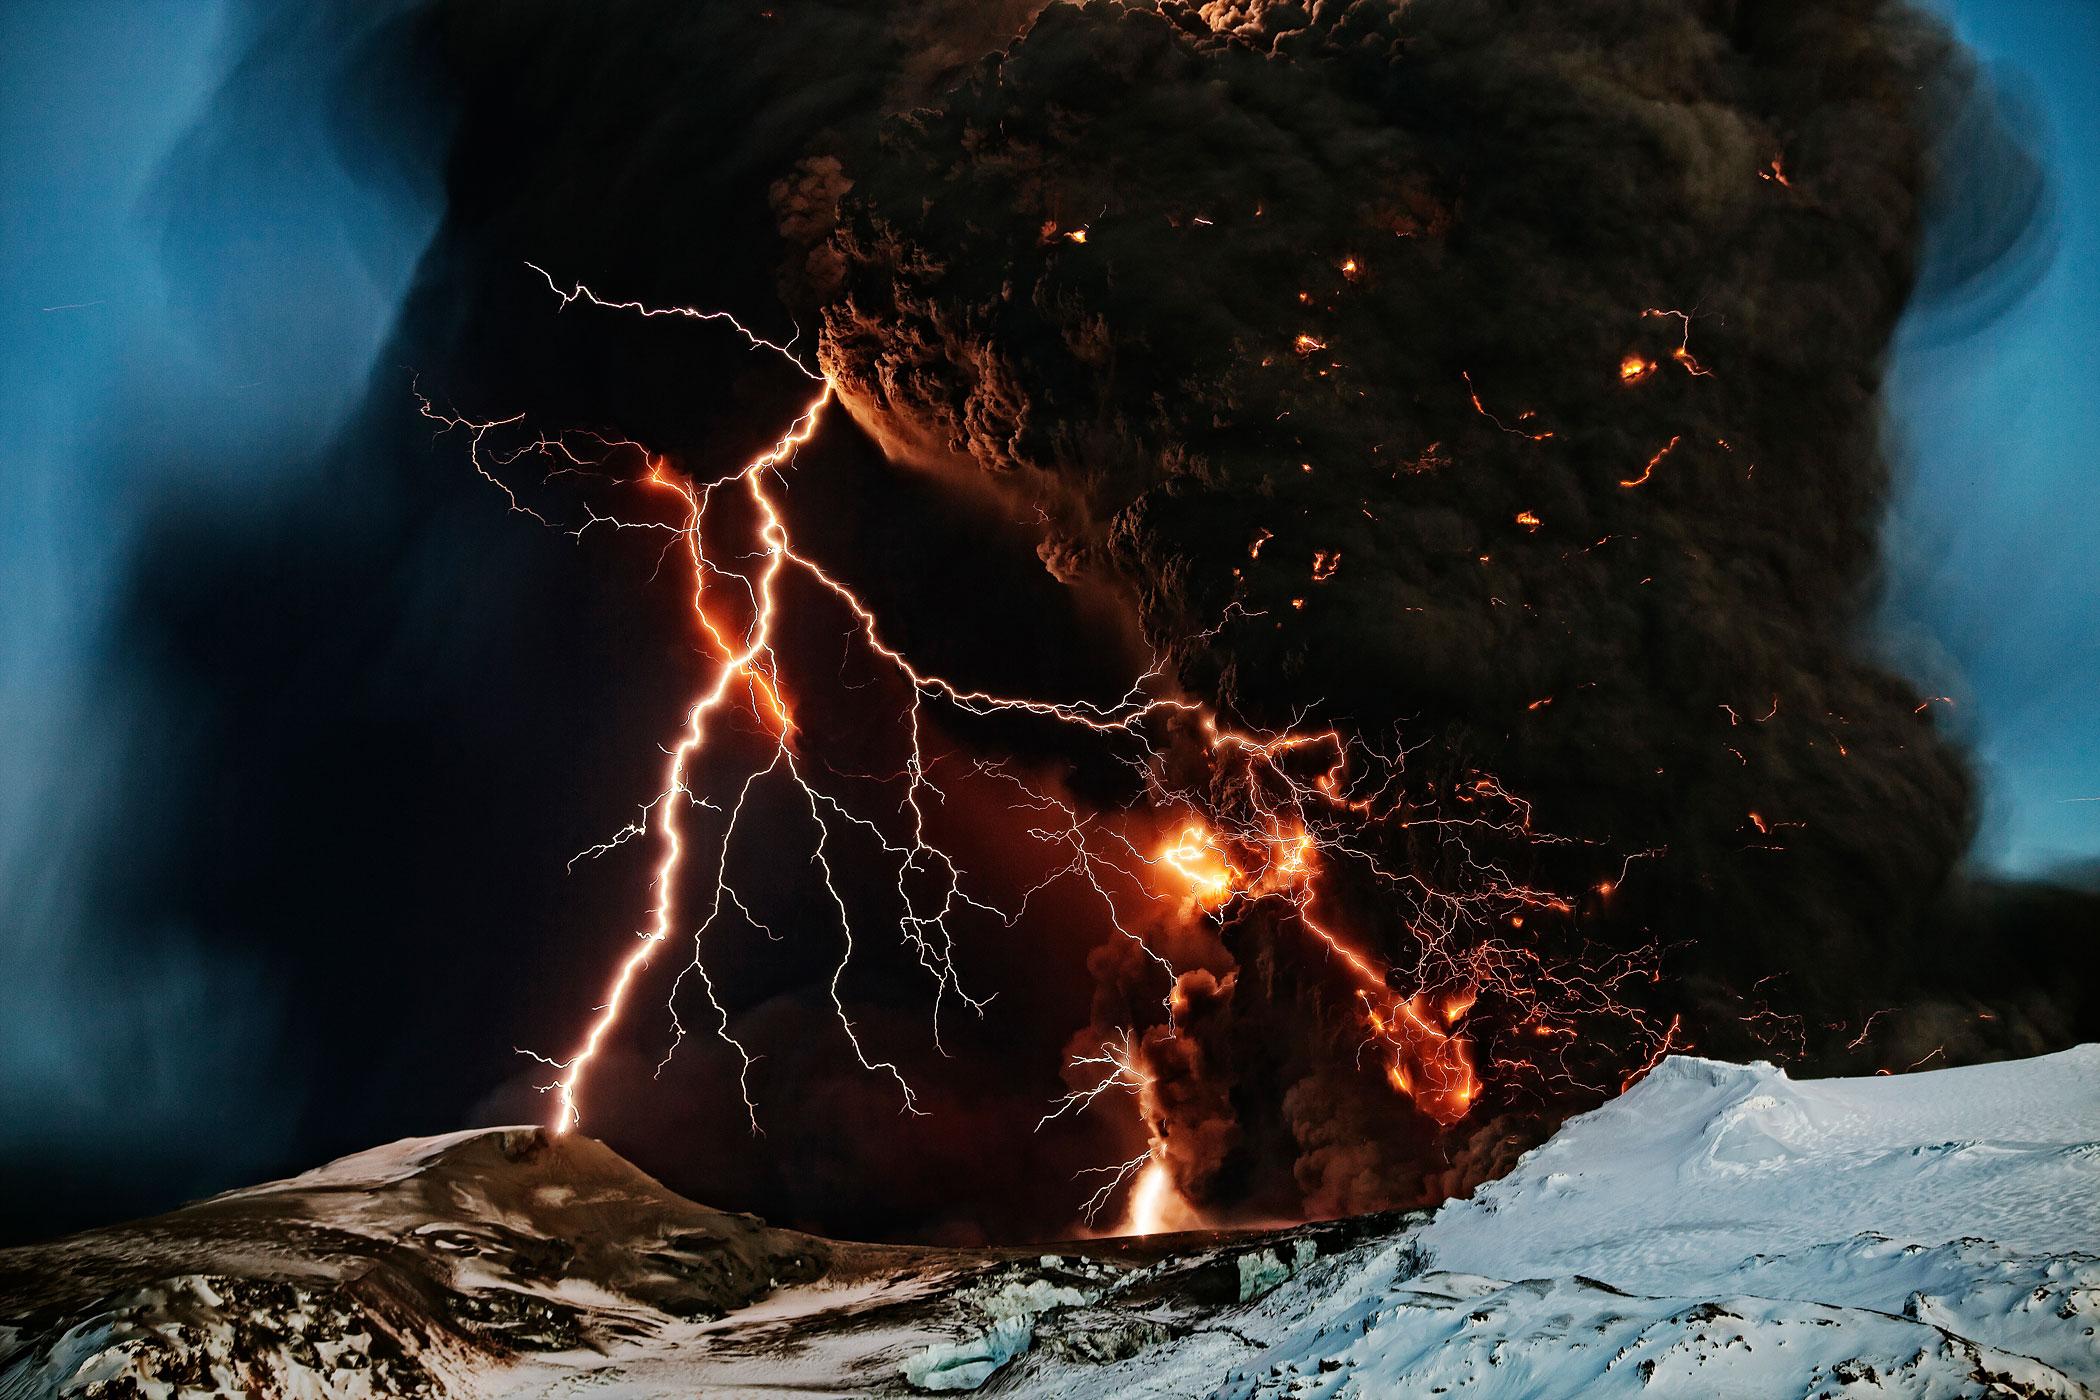 Lightning streaks across the sky as lava flows from a volcano in Eyjafjallajokul, April 17, 2010.